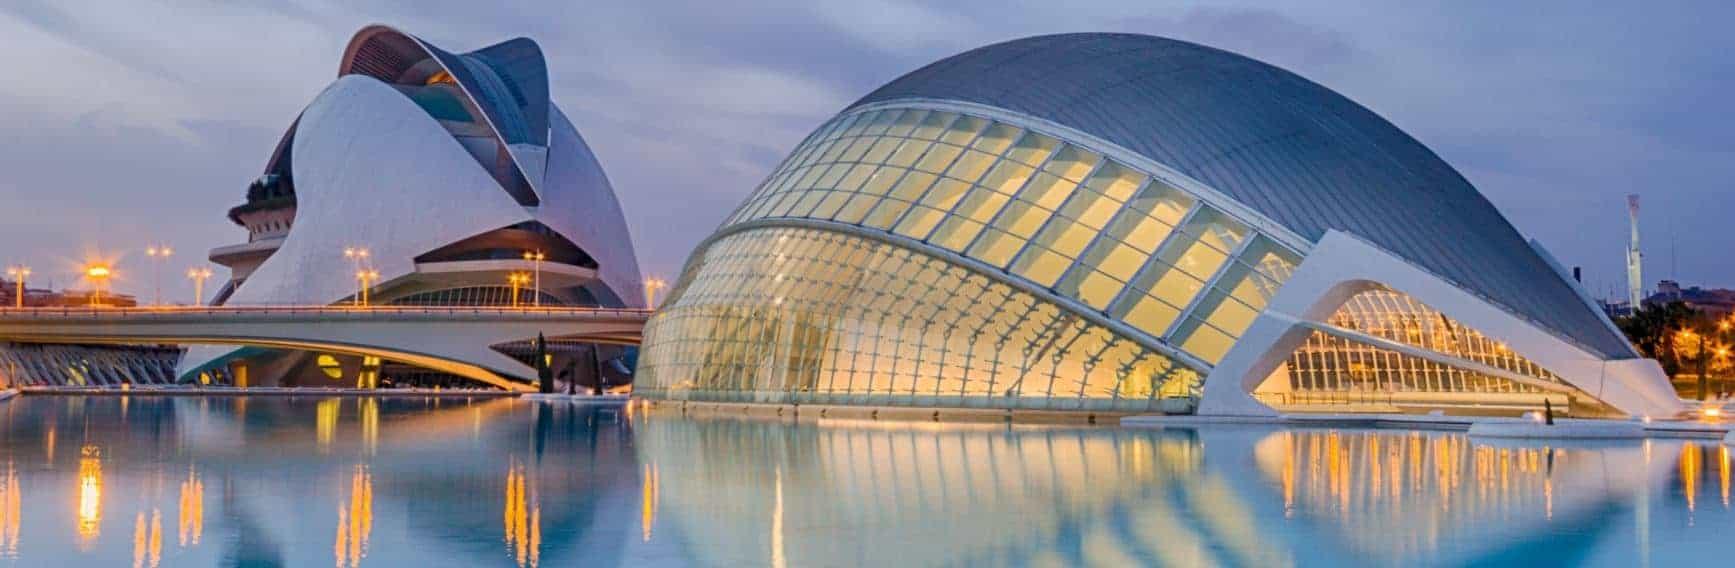 Datenbank Real Estate Investment Gesellschaften Spanien